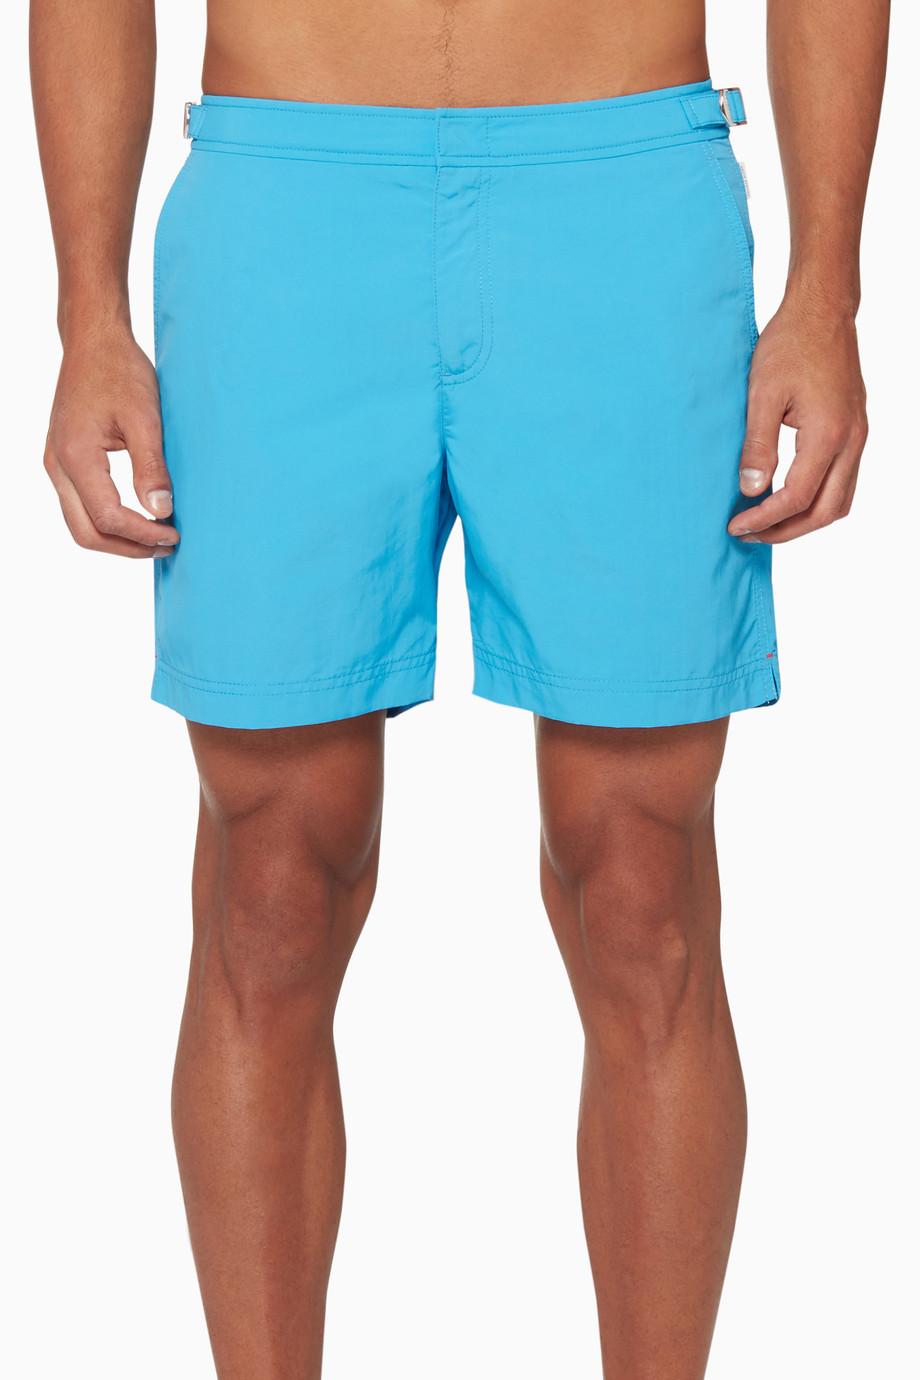 8a4f461bc7 Shop Orlebar Brown Blue Bulldog Mid-Length Swim Shorts for Men | Ounass